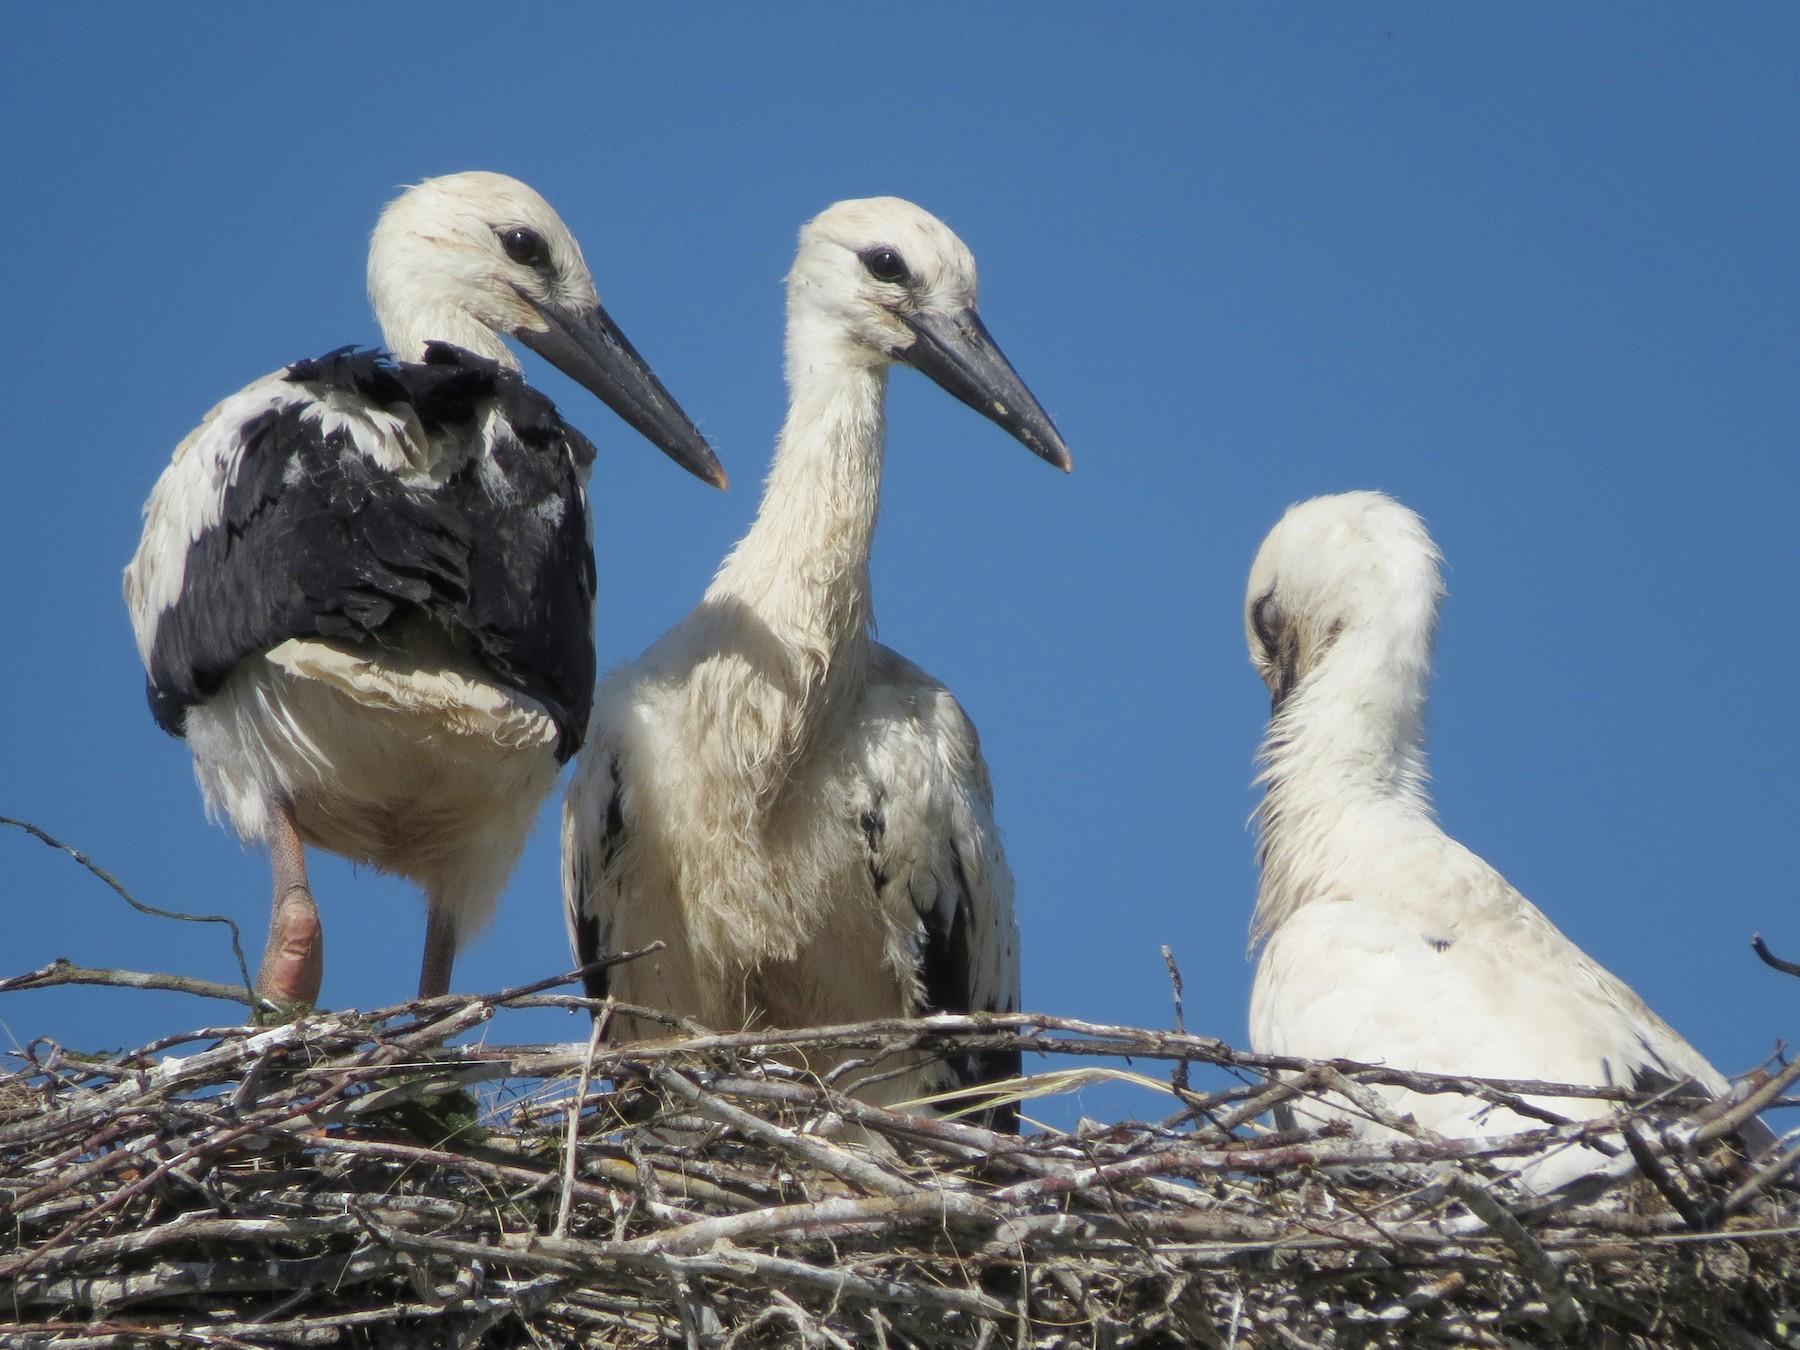 White Stork - Miguel Rodríguez Esteban